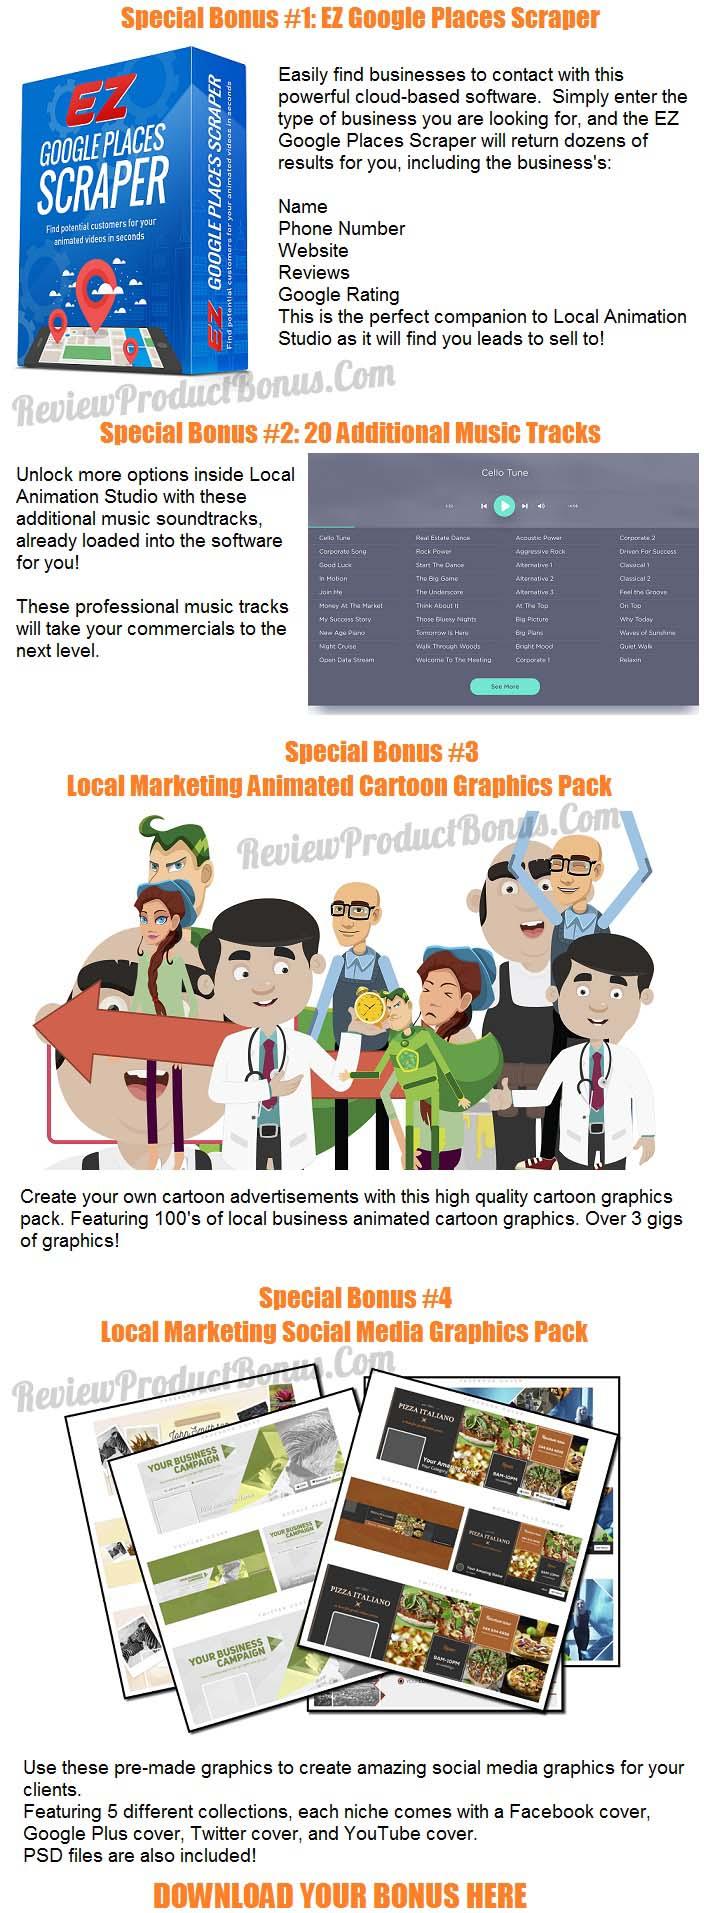 Local-Animation-Studio-Bonus